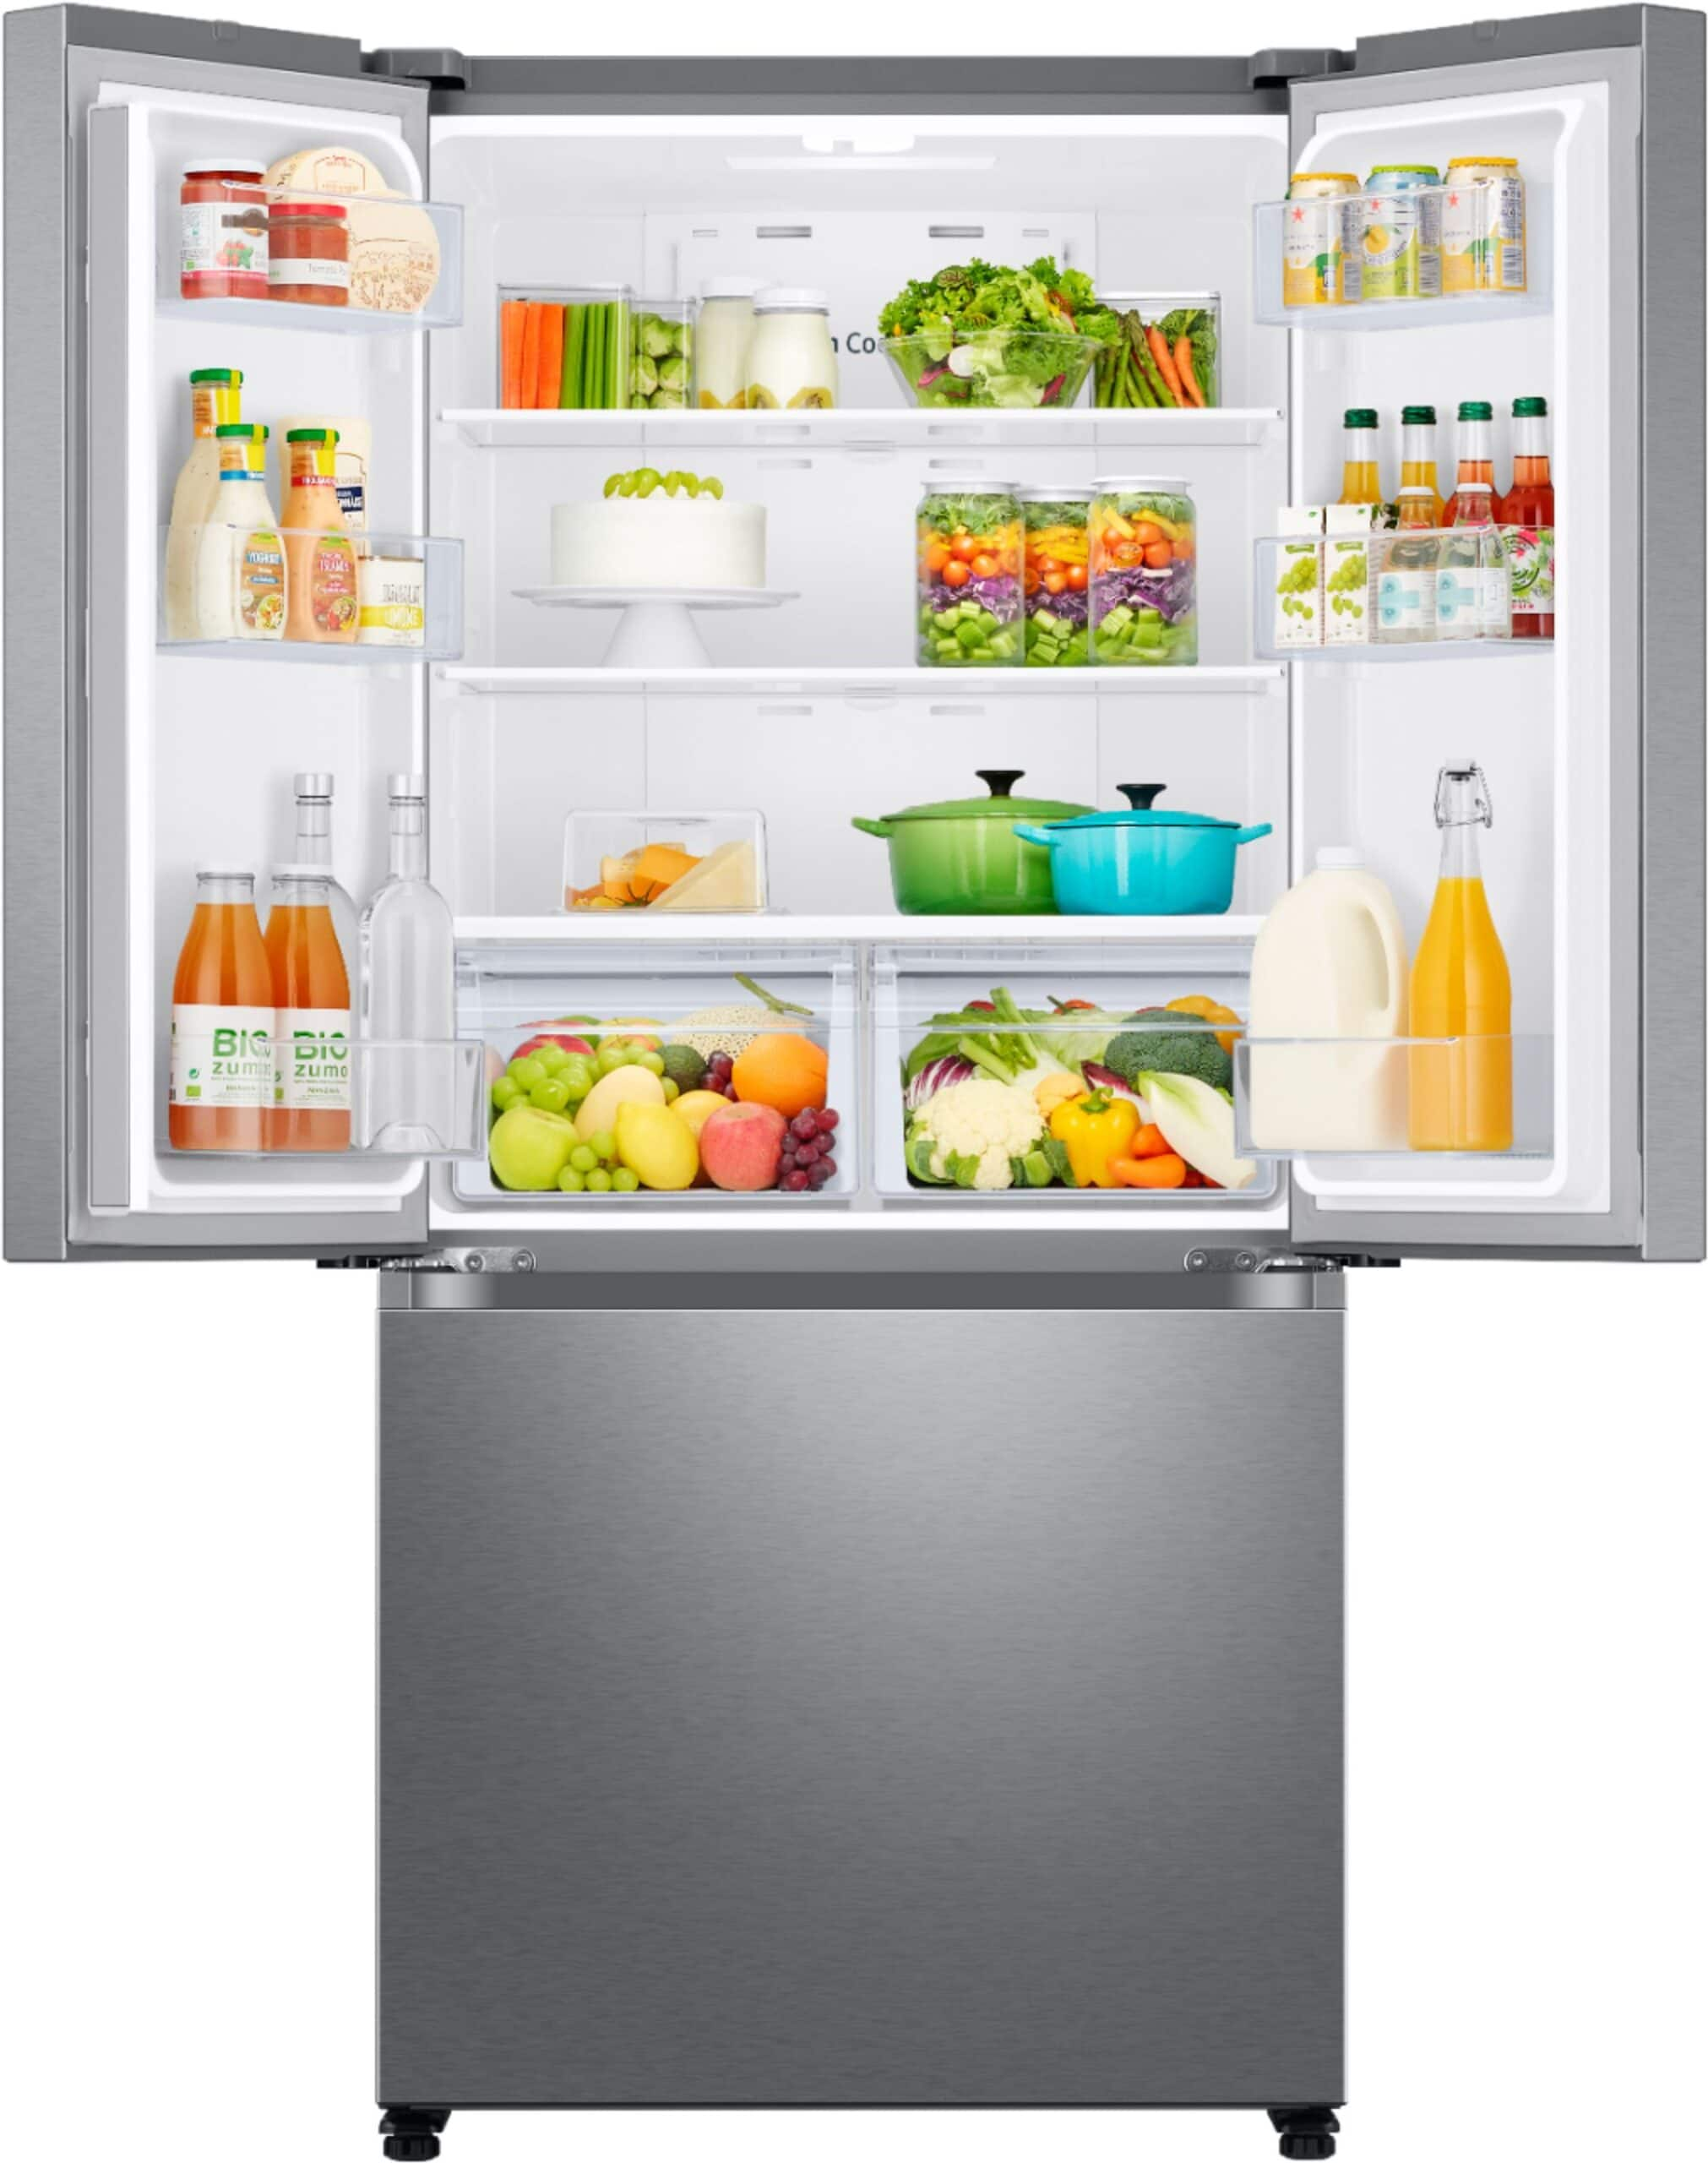 fridge filled food